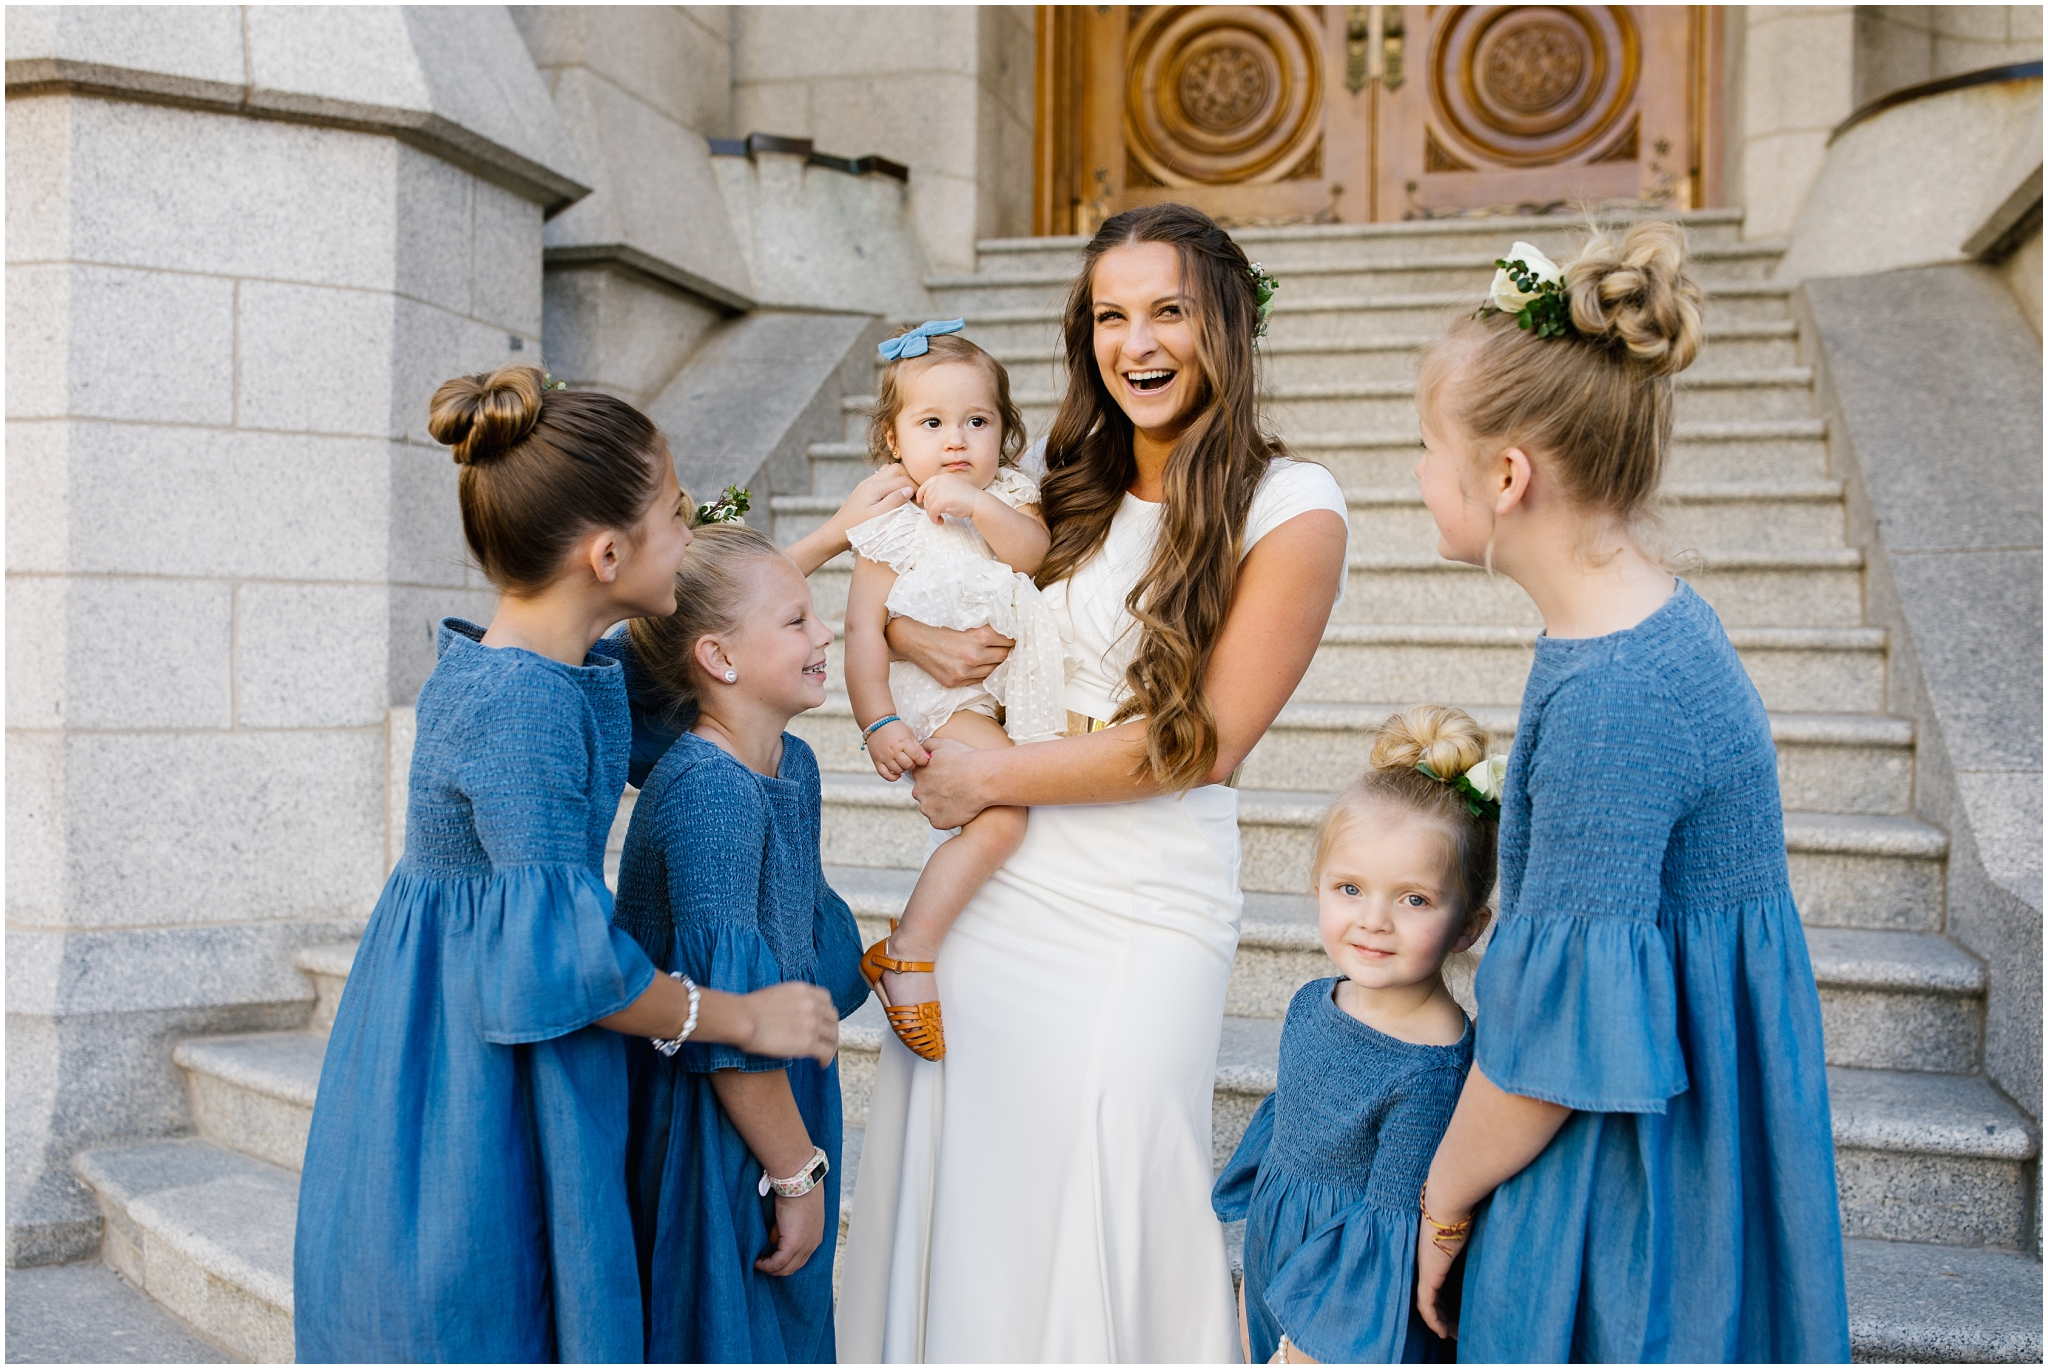 JC-Wedding-66_Lizzie-B-Imagery-Utah-Wedding-Photographer-Salt-Lake-City-Temple-Joseph-Smith-Memorial-Building-Reception.jpg